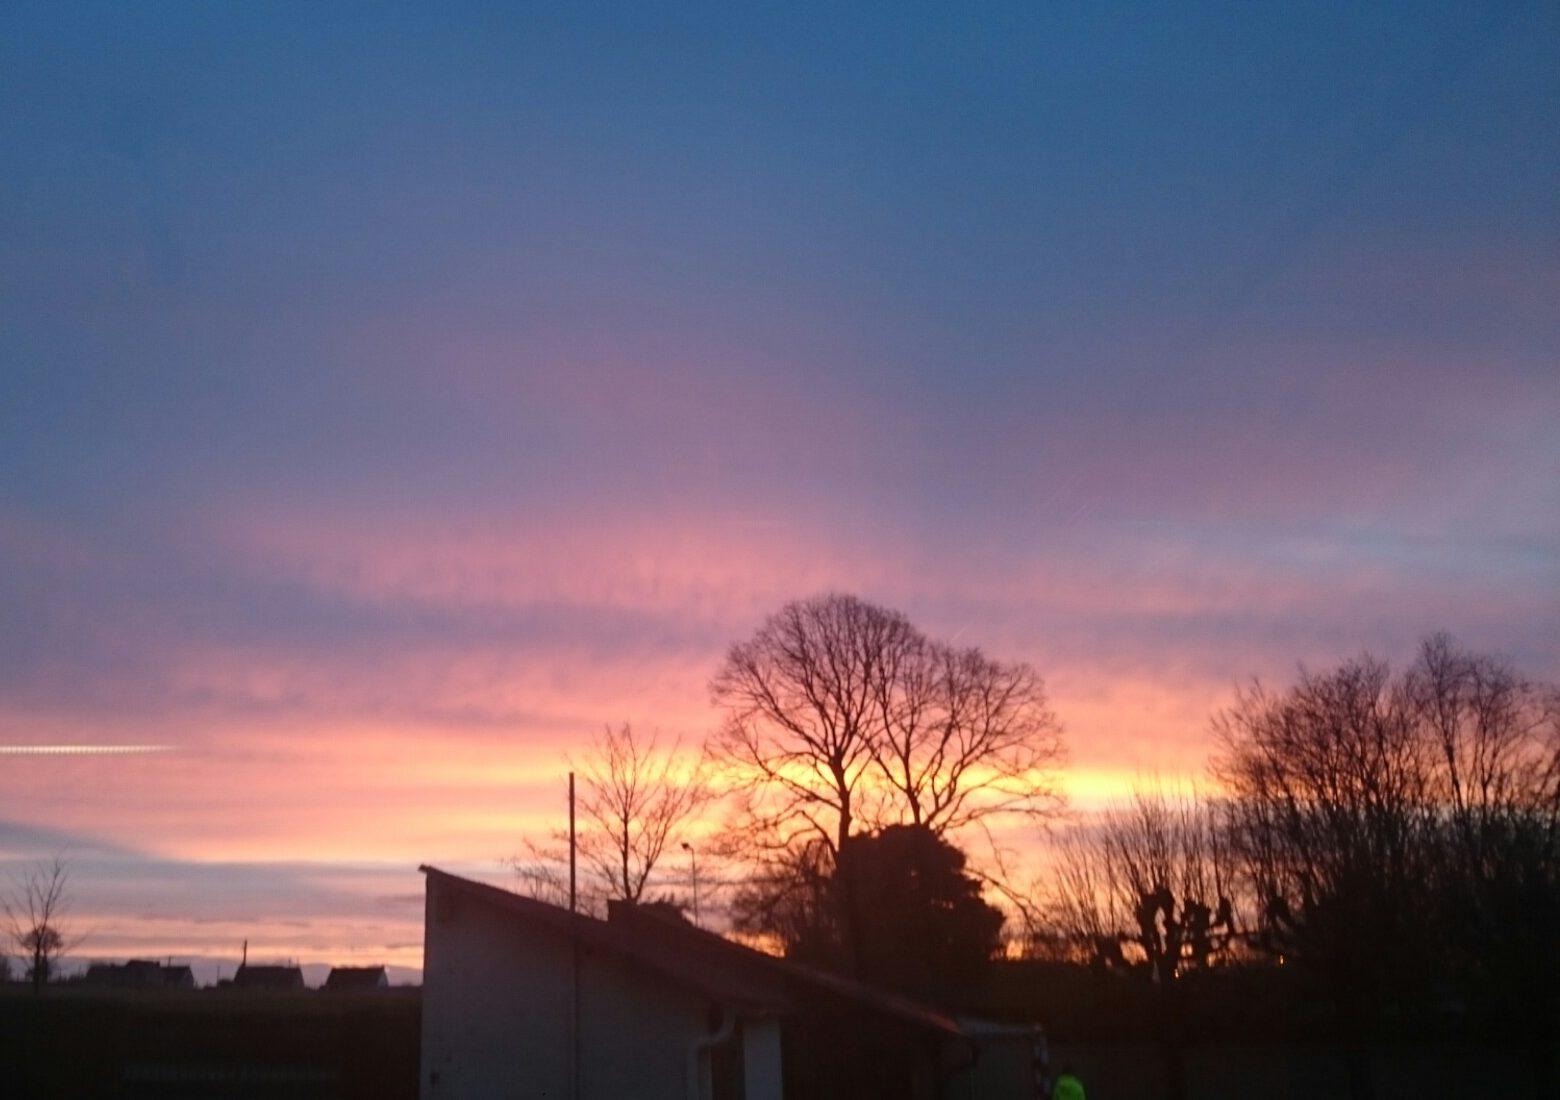 Sunset in Rural France.